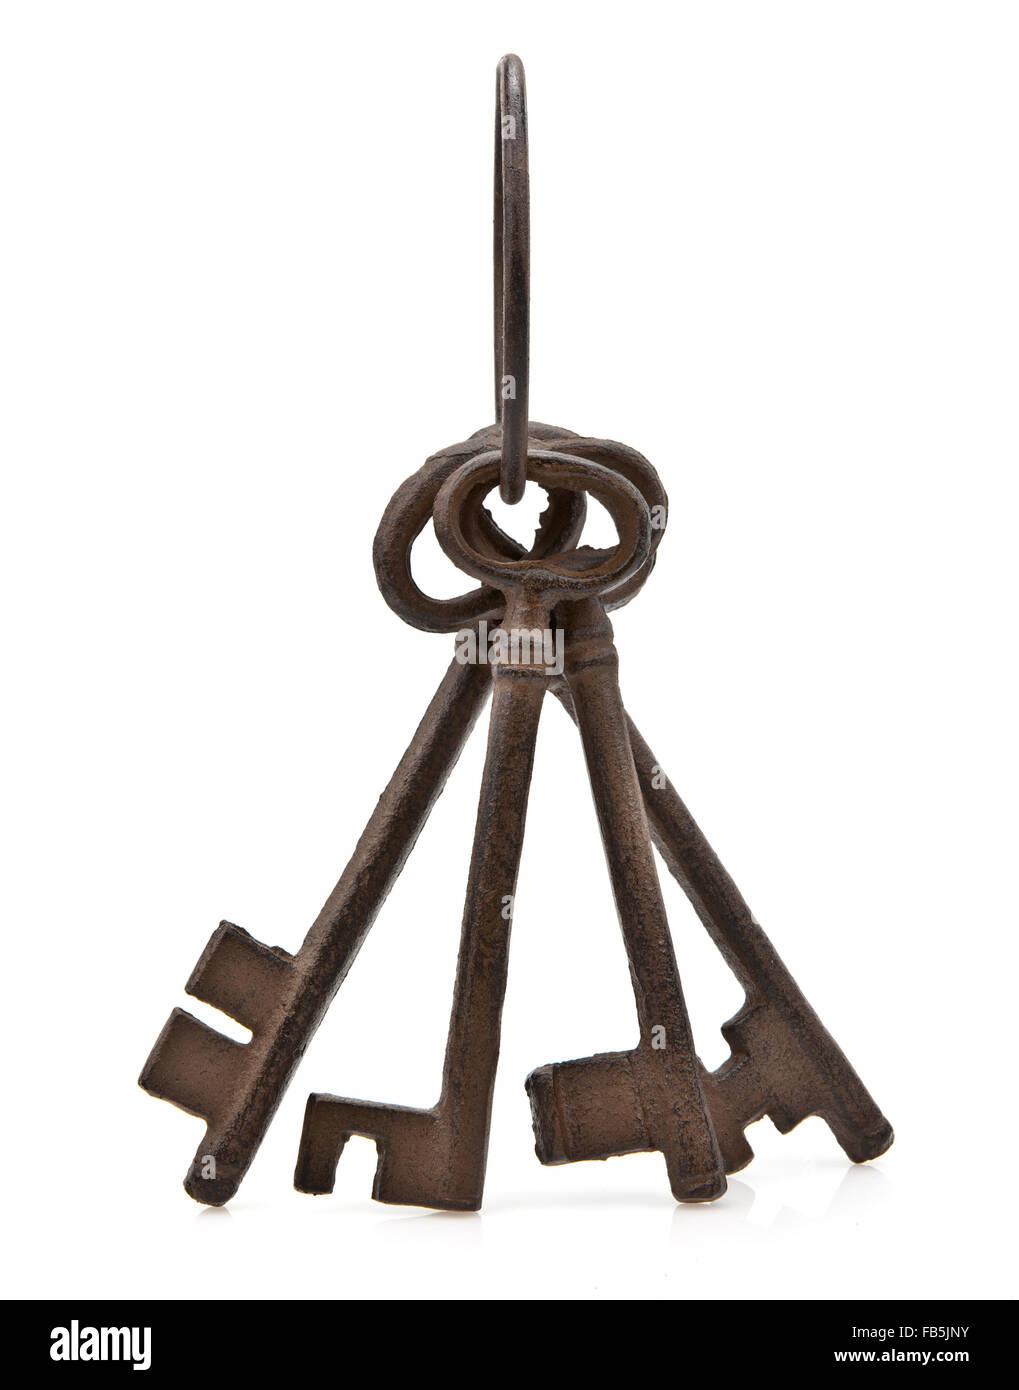 Set of old antique keys over white background - Stock Image